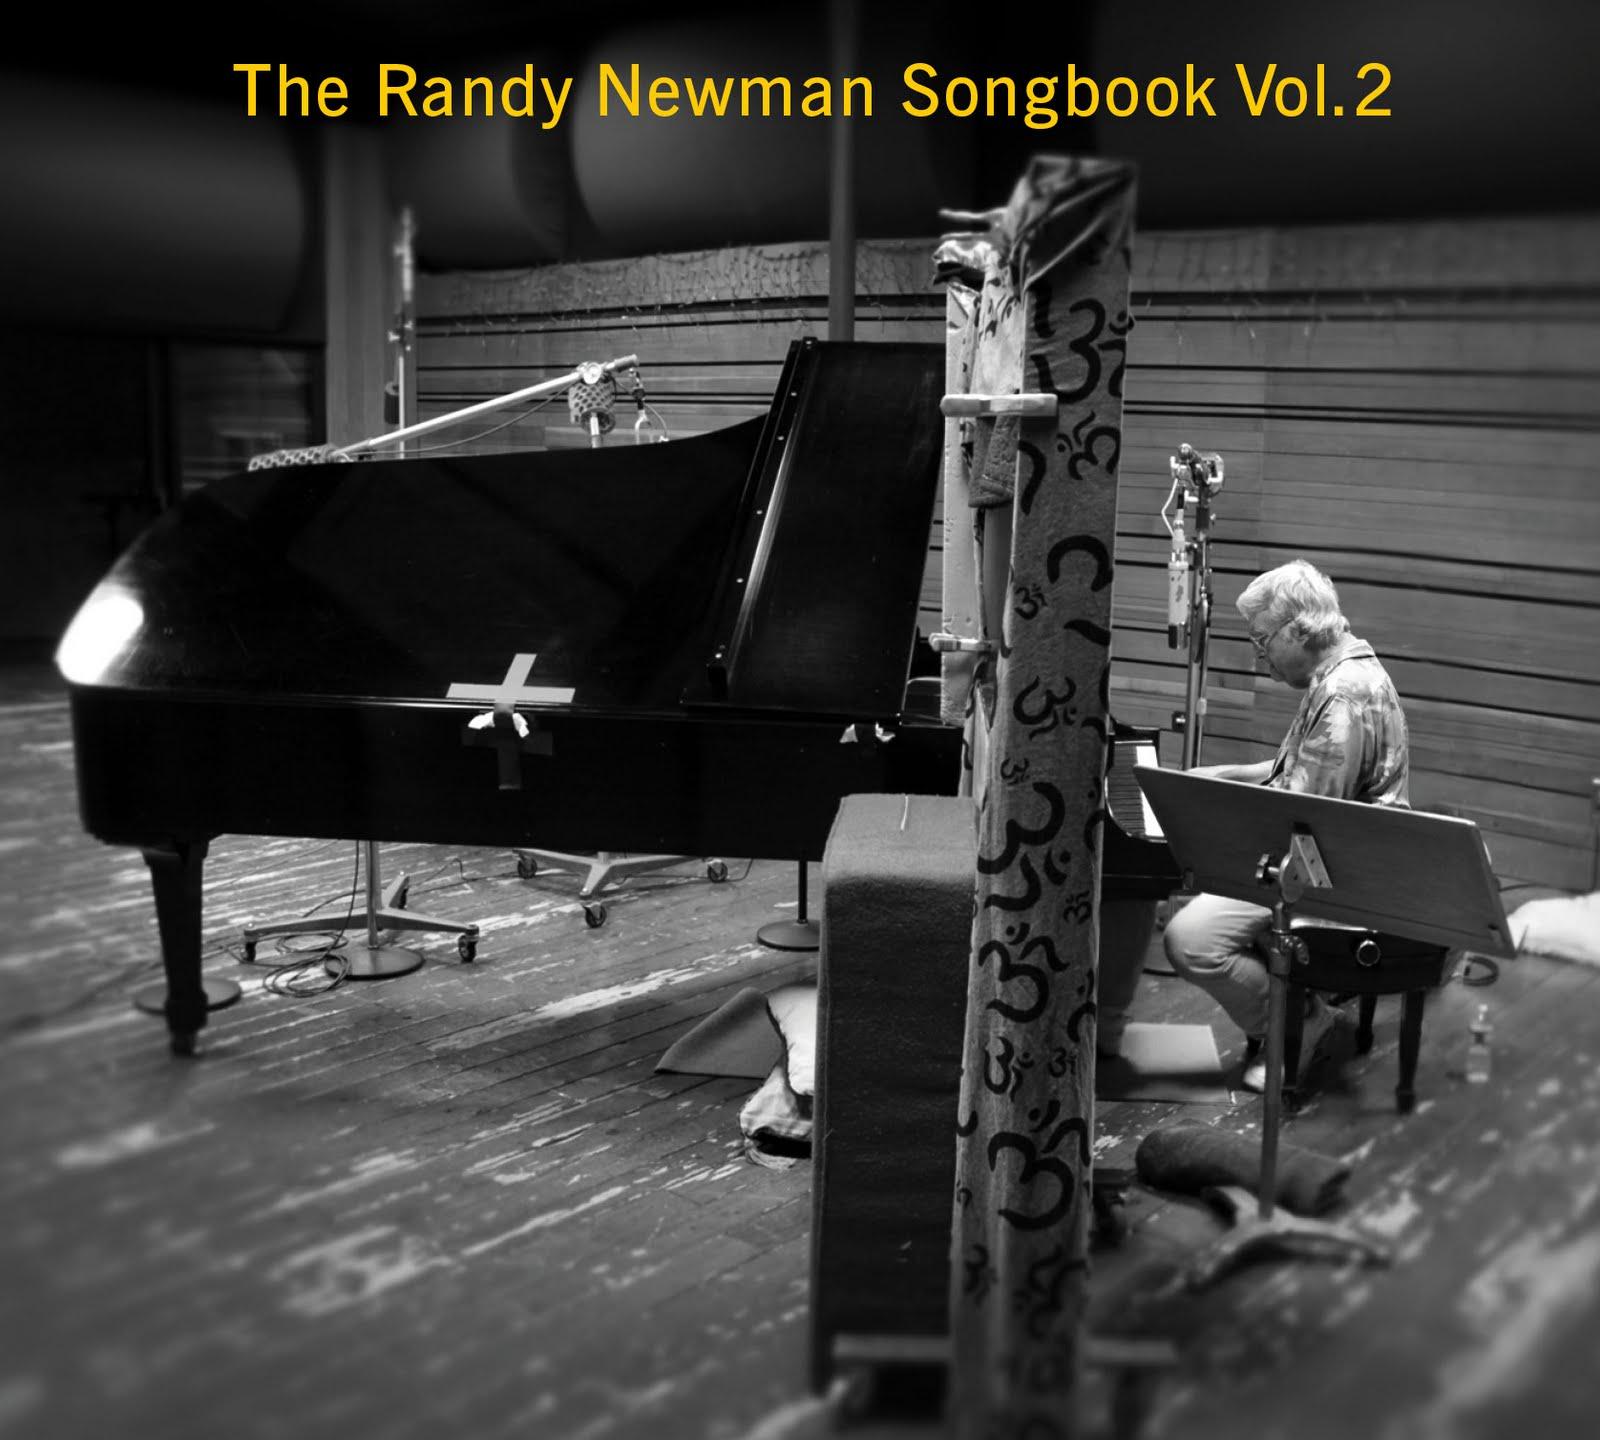 Randy Newman – The Randy Newman Songbook Vol. 2